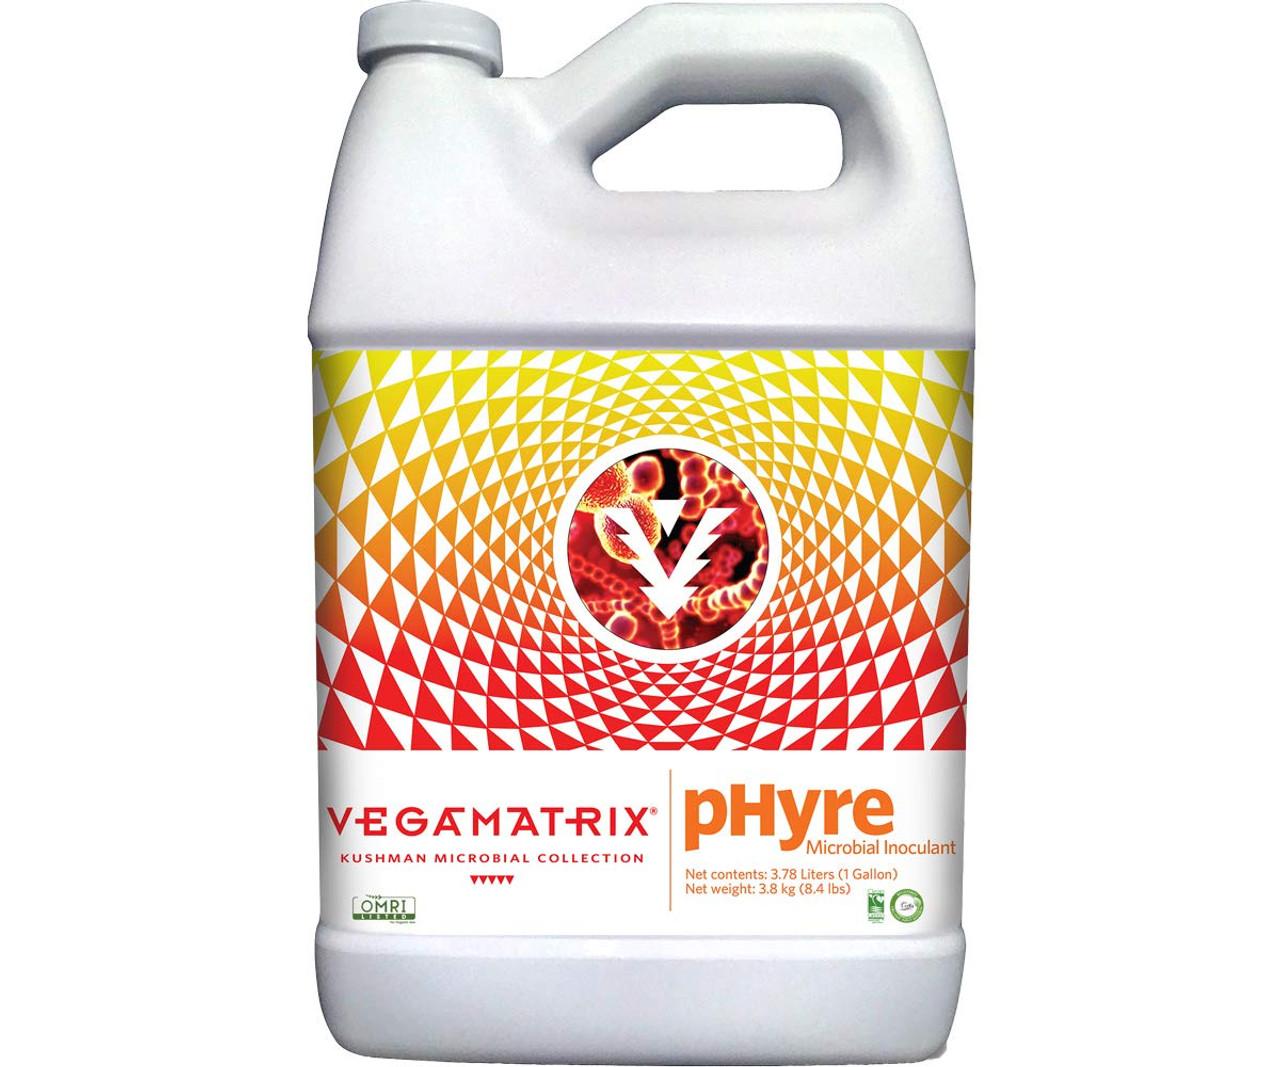 Vegamatrix pHyre Microbial 1 gal